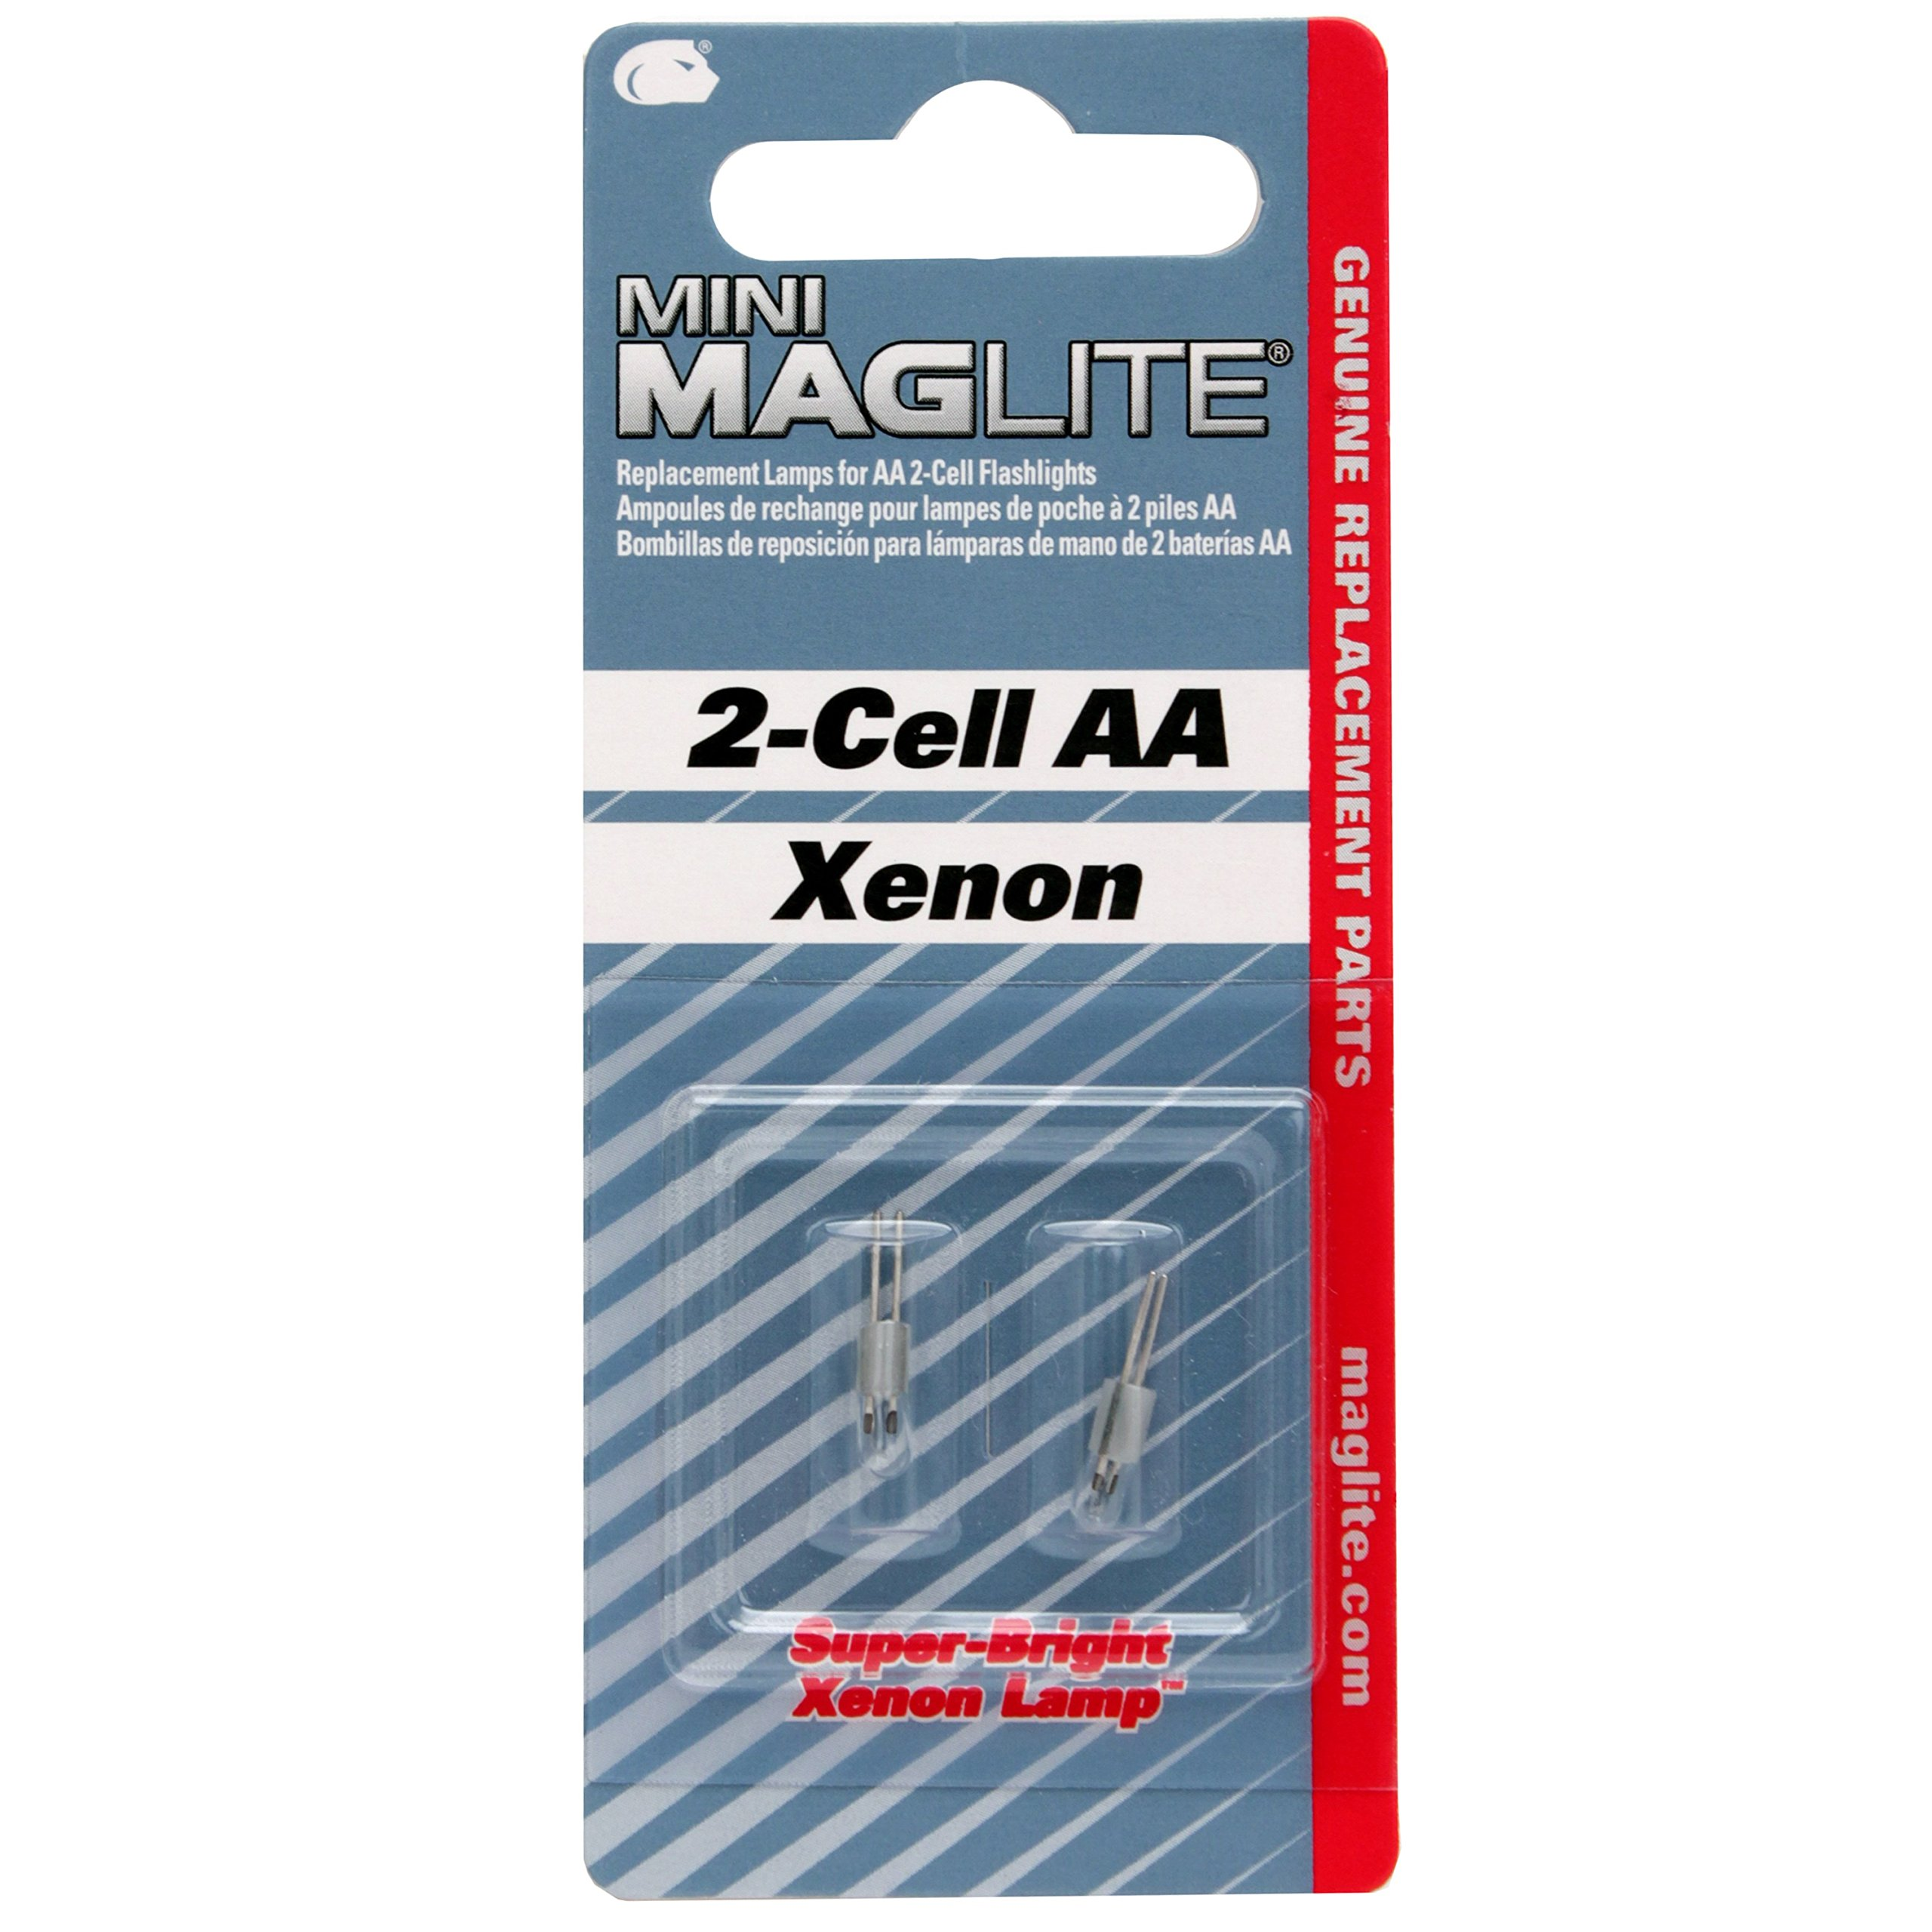 Linterna Maglite : Reemplazo Bulbo Para Mini Mag-lite